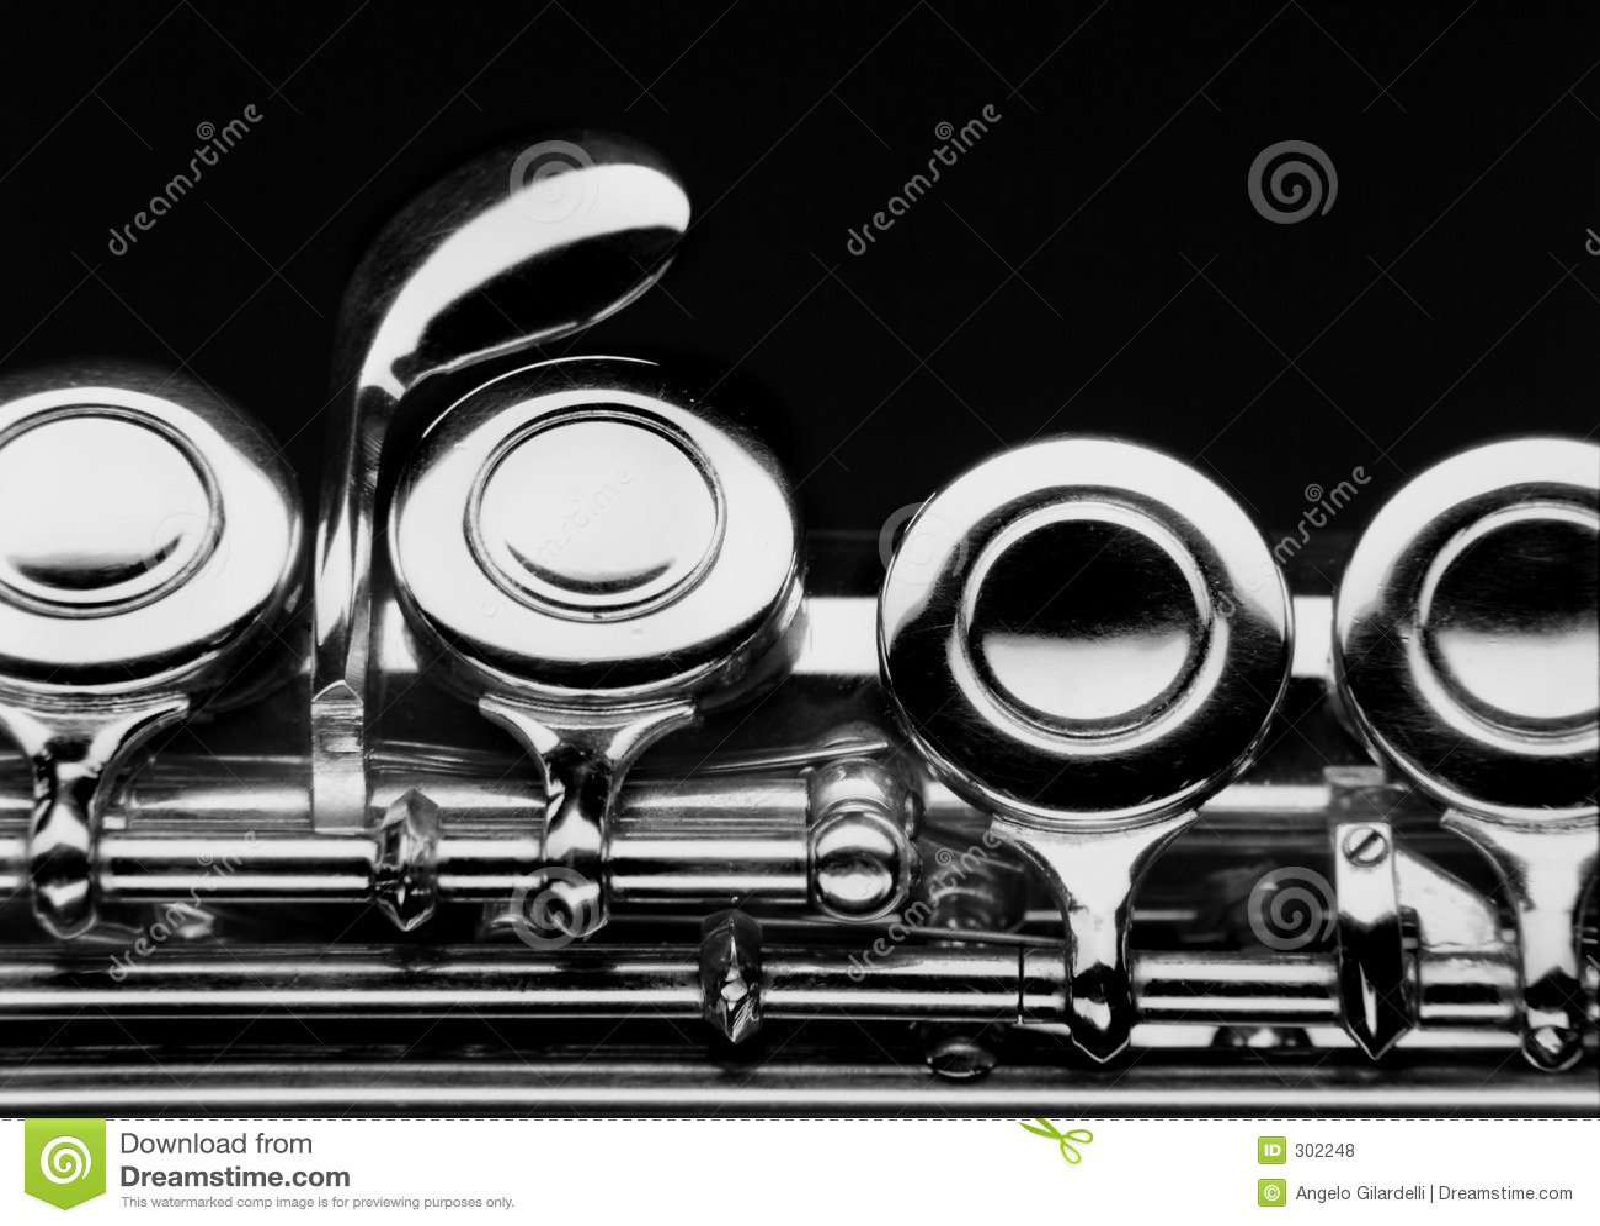 Dolce flauto flet